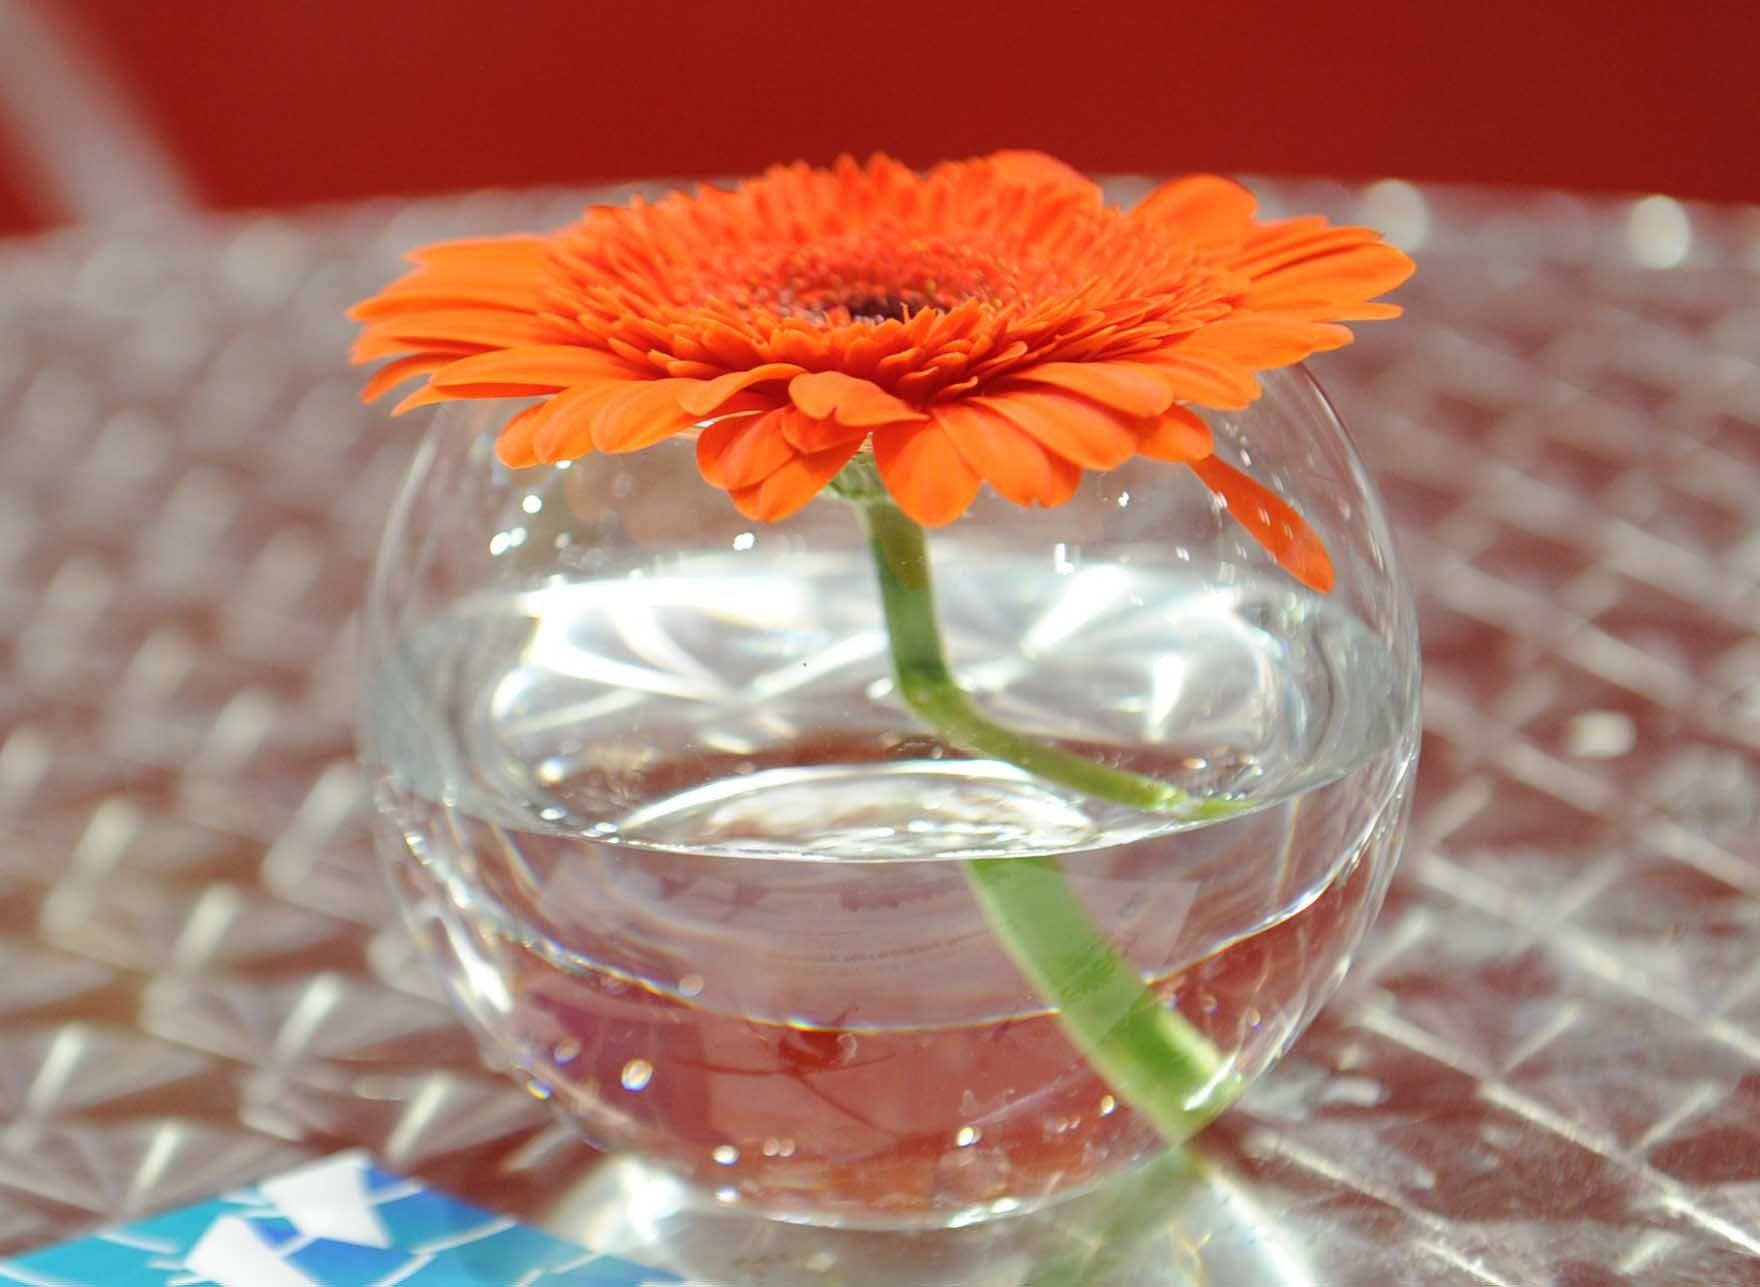 flower vase online india of 47 od single orange gerbera in gfb celebraciones pinterest regarding 47 od single orange gerbera in gfb